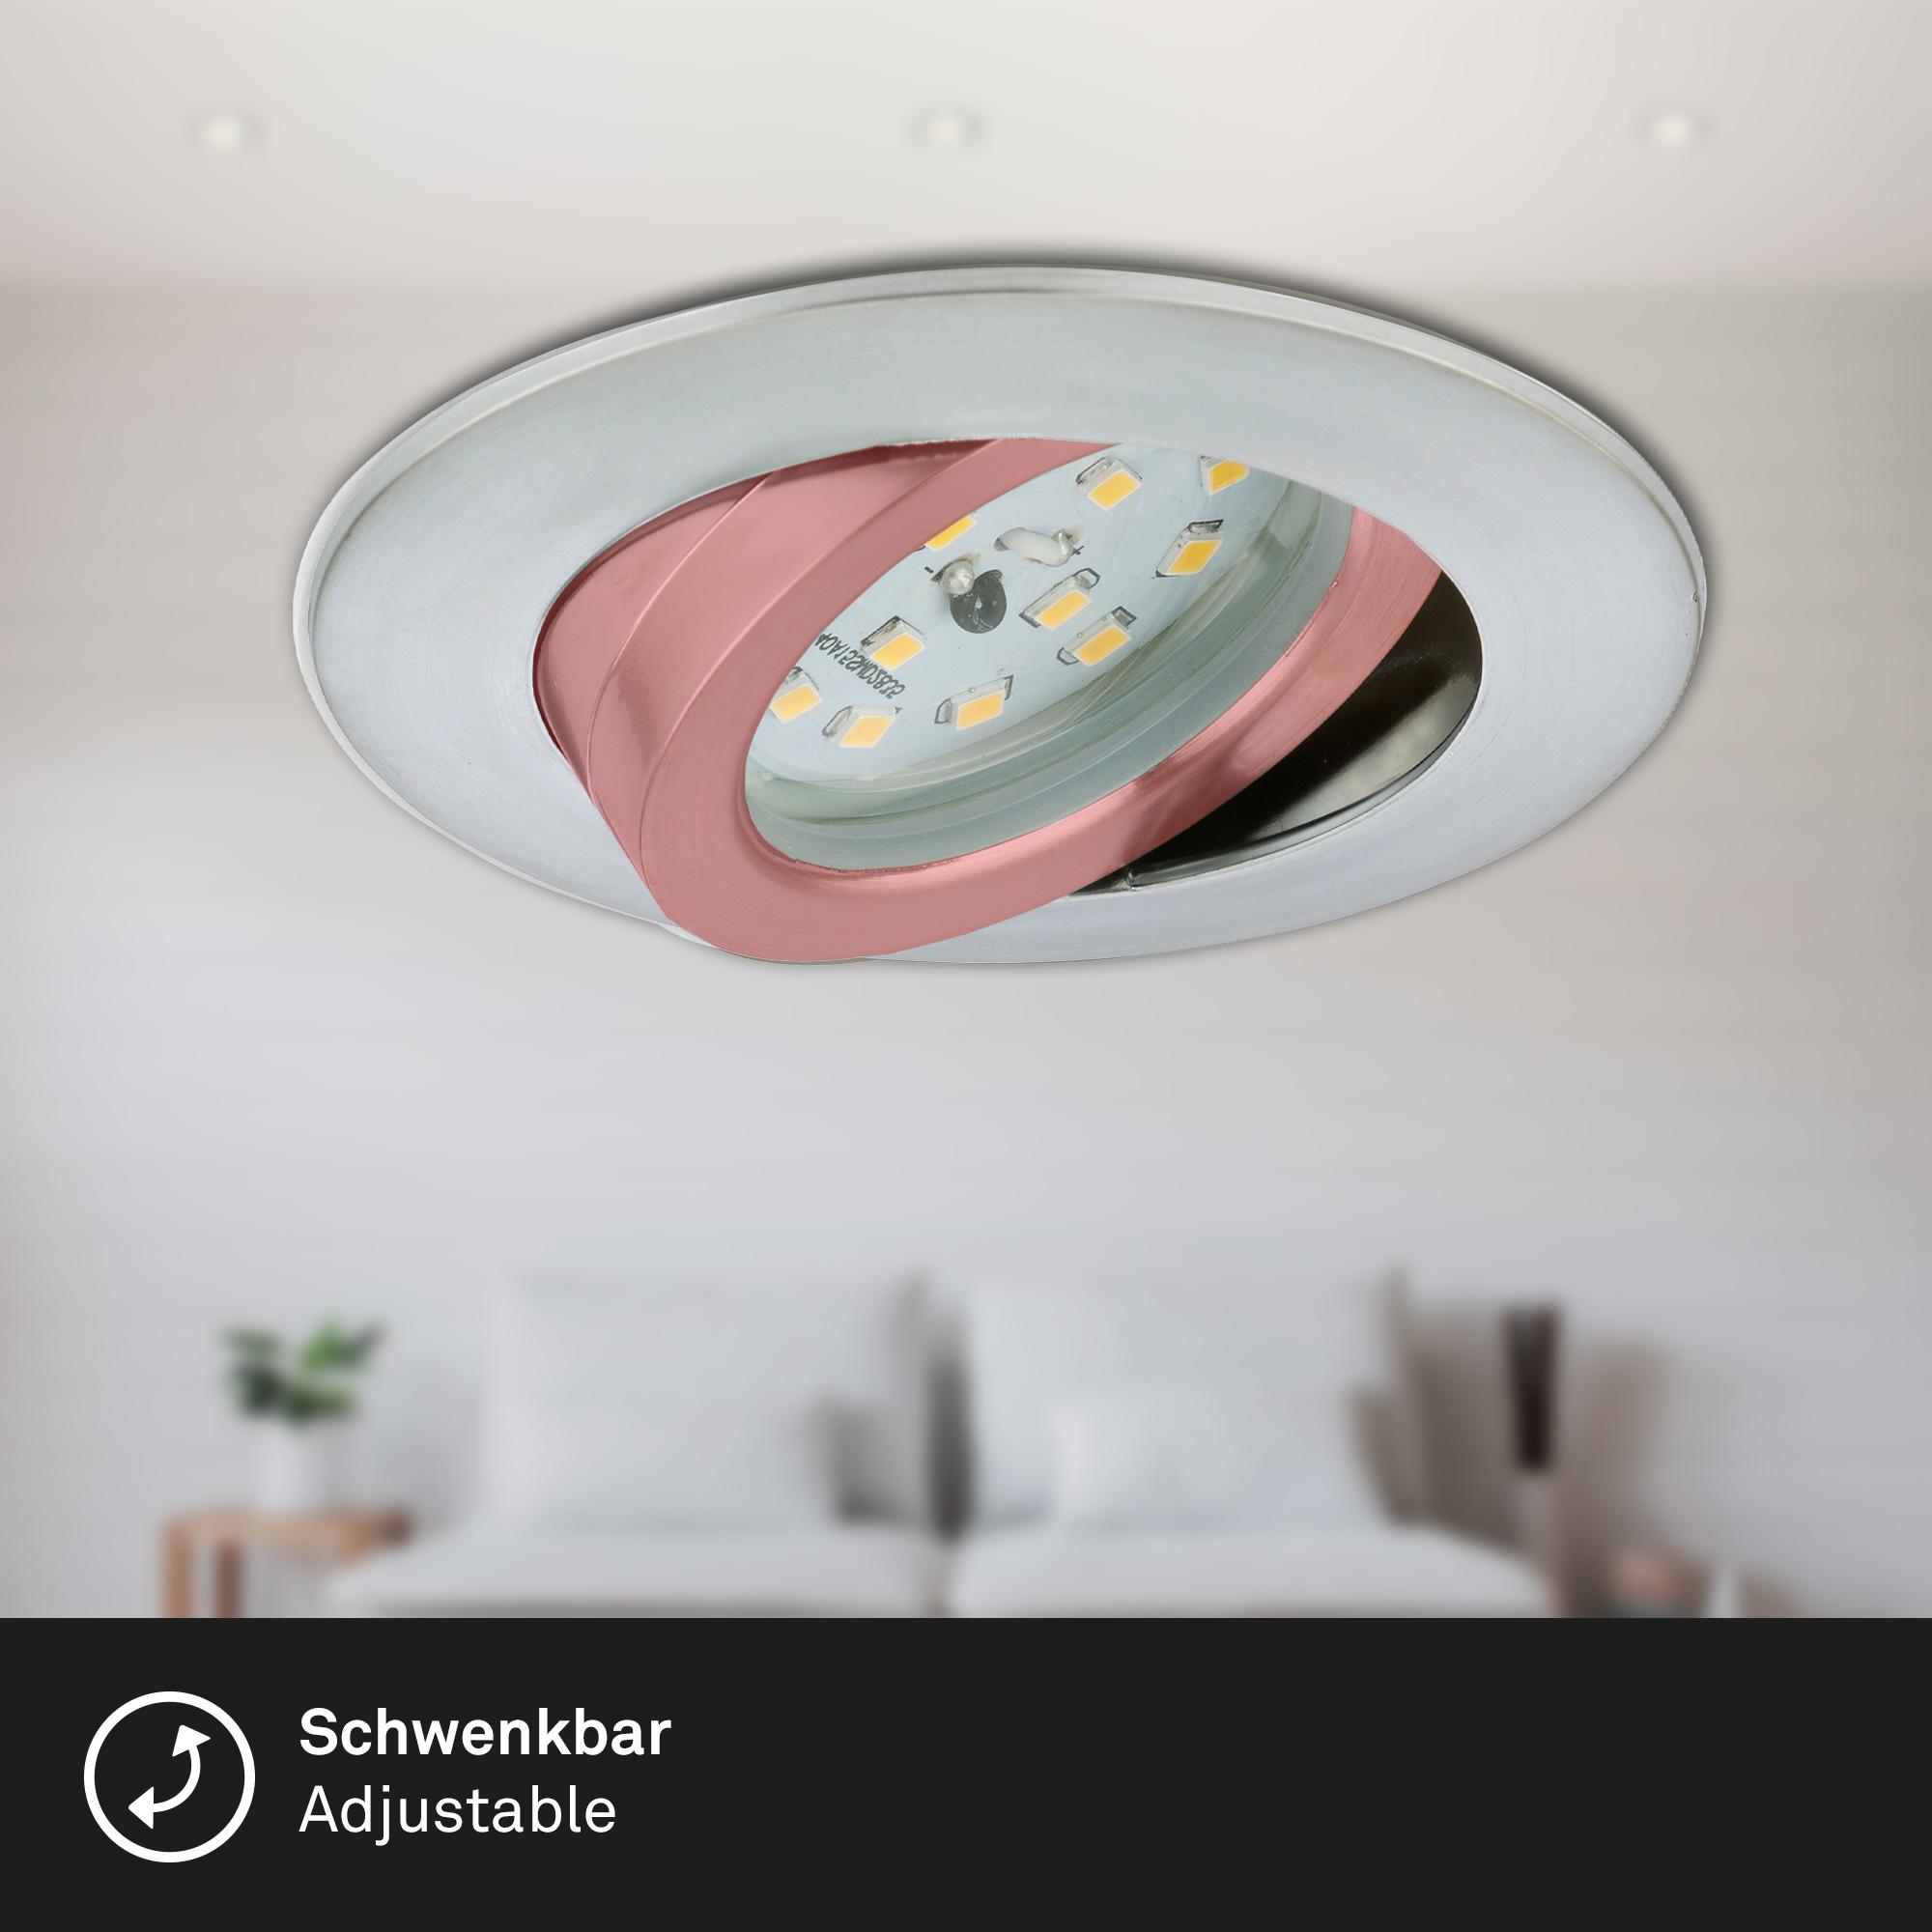 LED Einbauleuchte, Ø 8,2 cm, 5,5 W, Alu